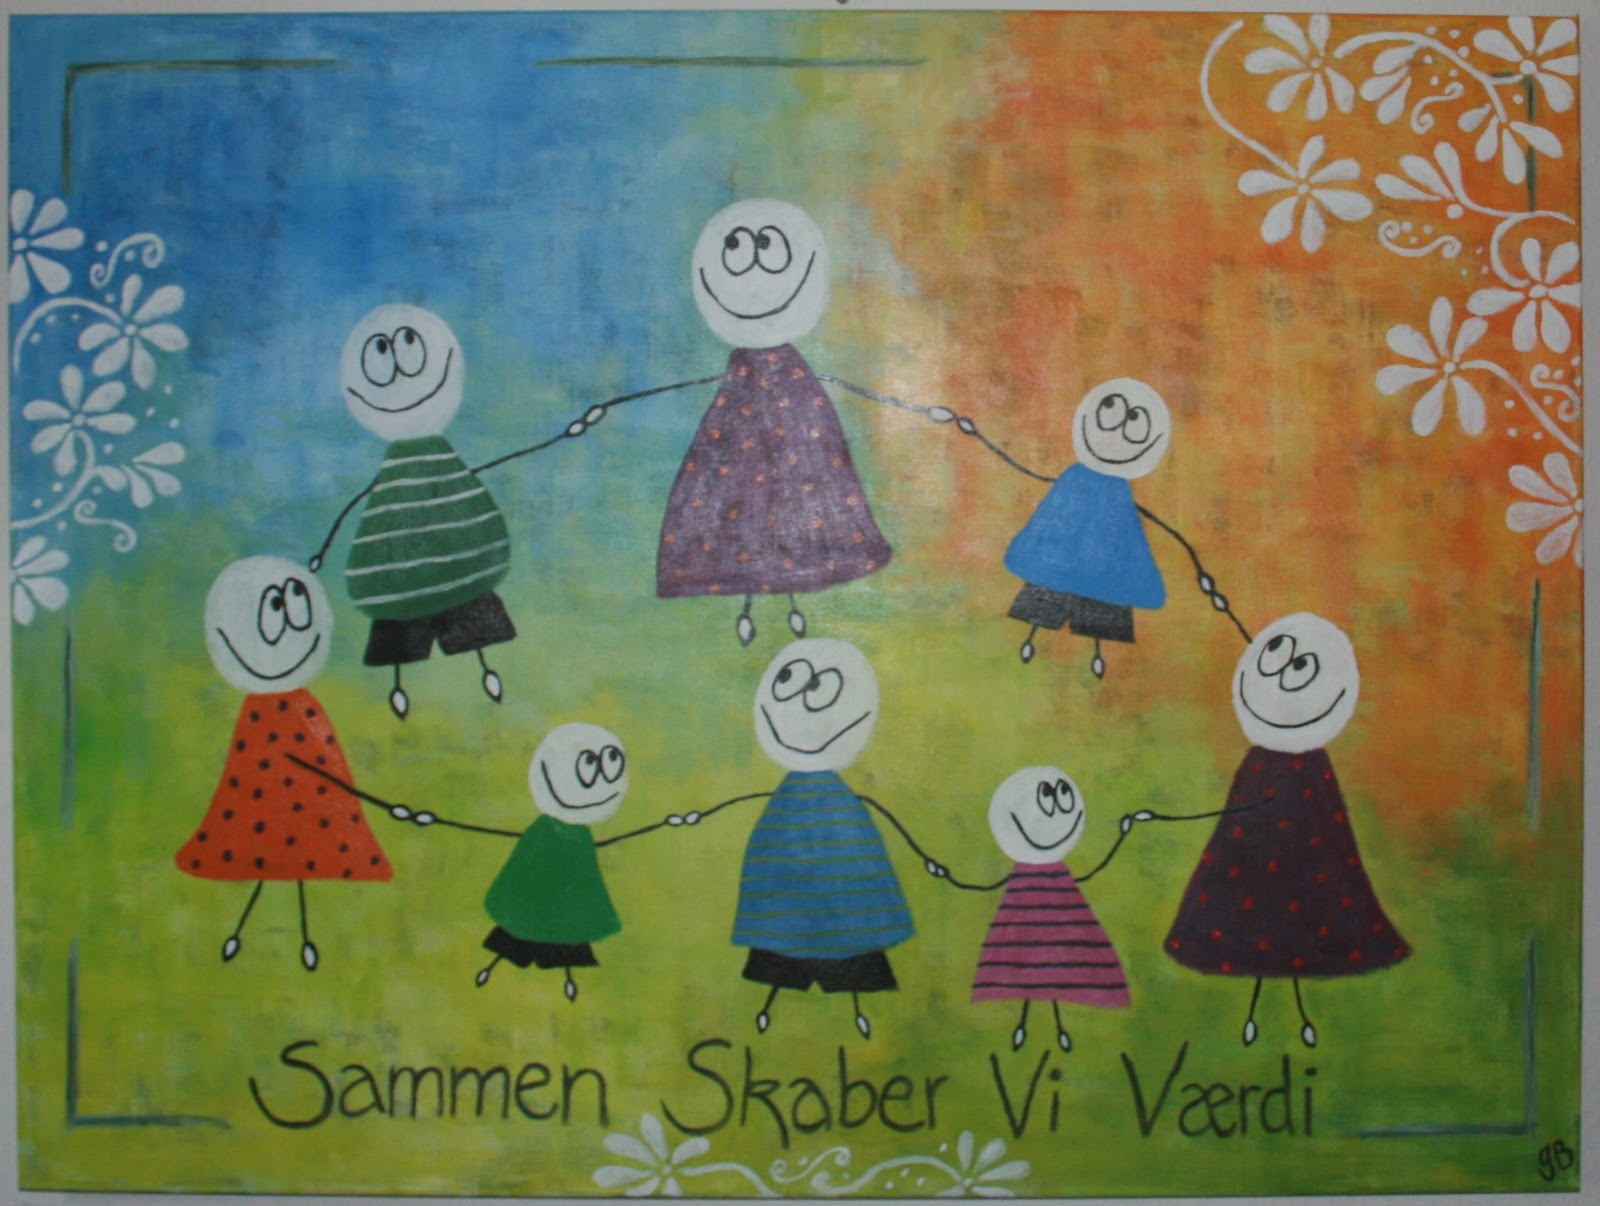 små malerier med citater Gitte Barlev: Om at give små malerier med citater